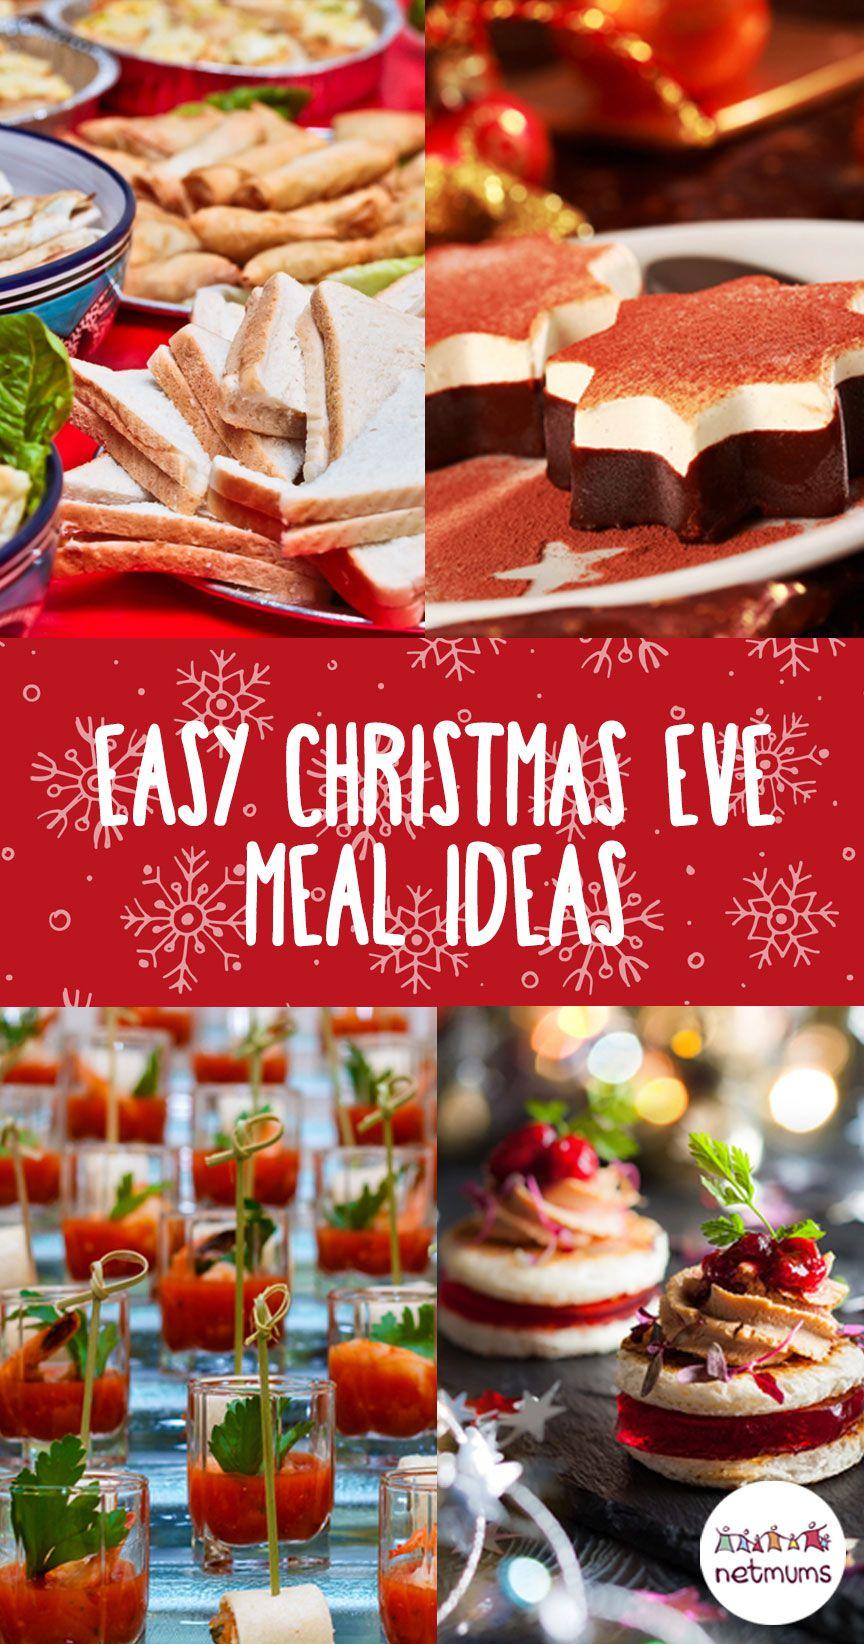 what meal on christmas eve?? Christmas eve meal